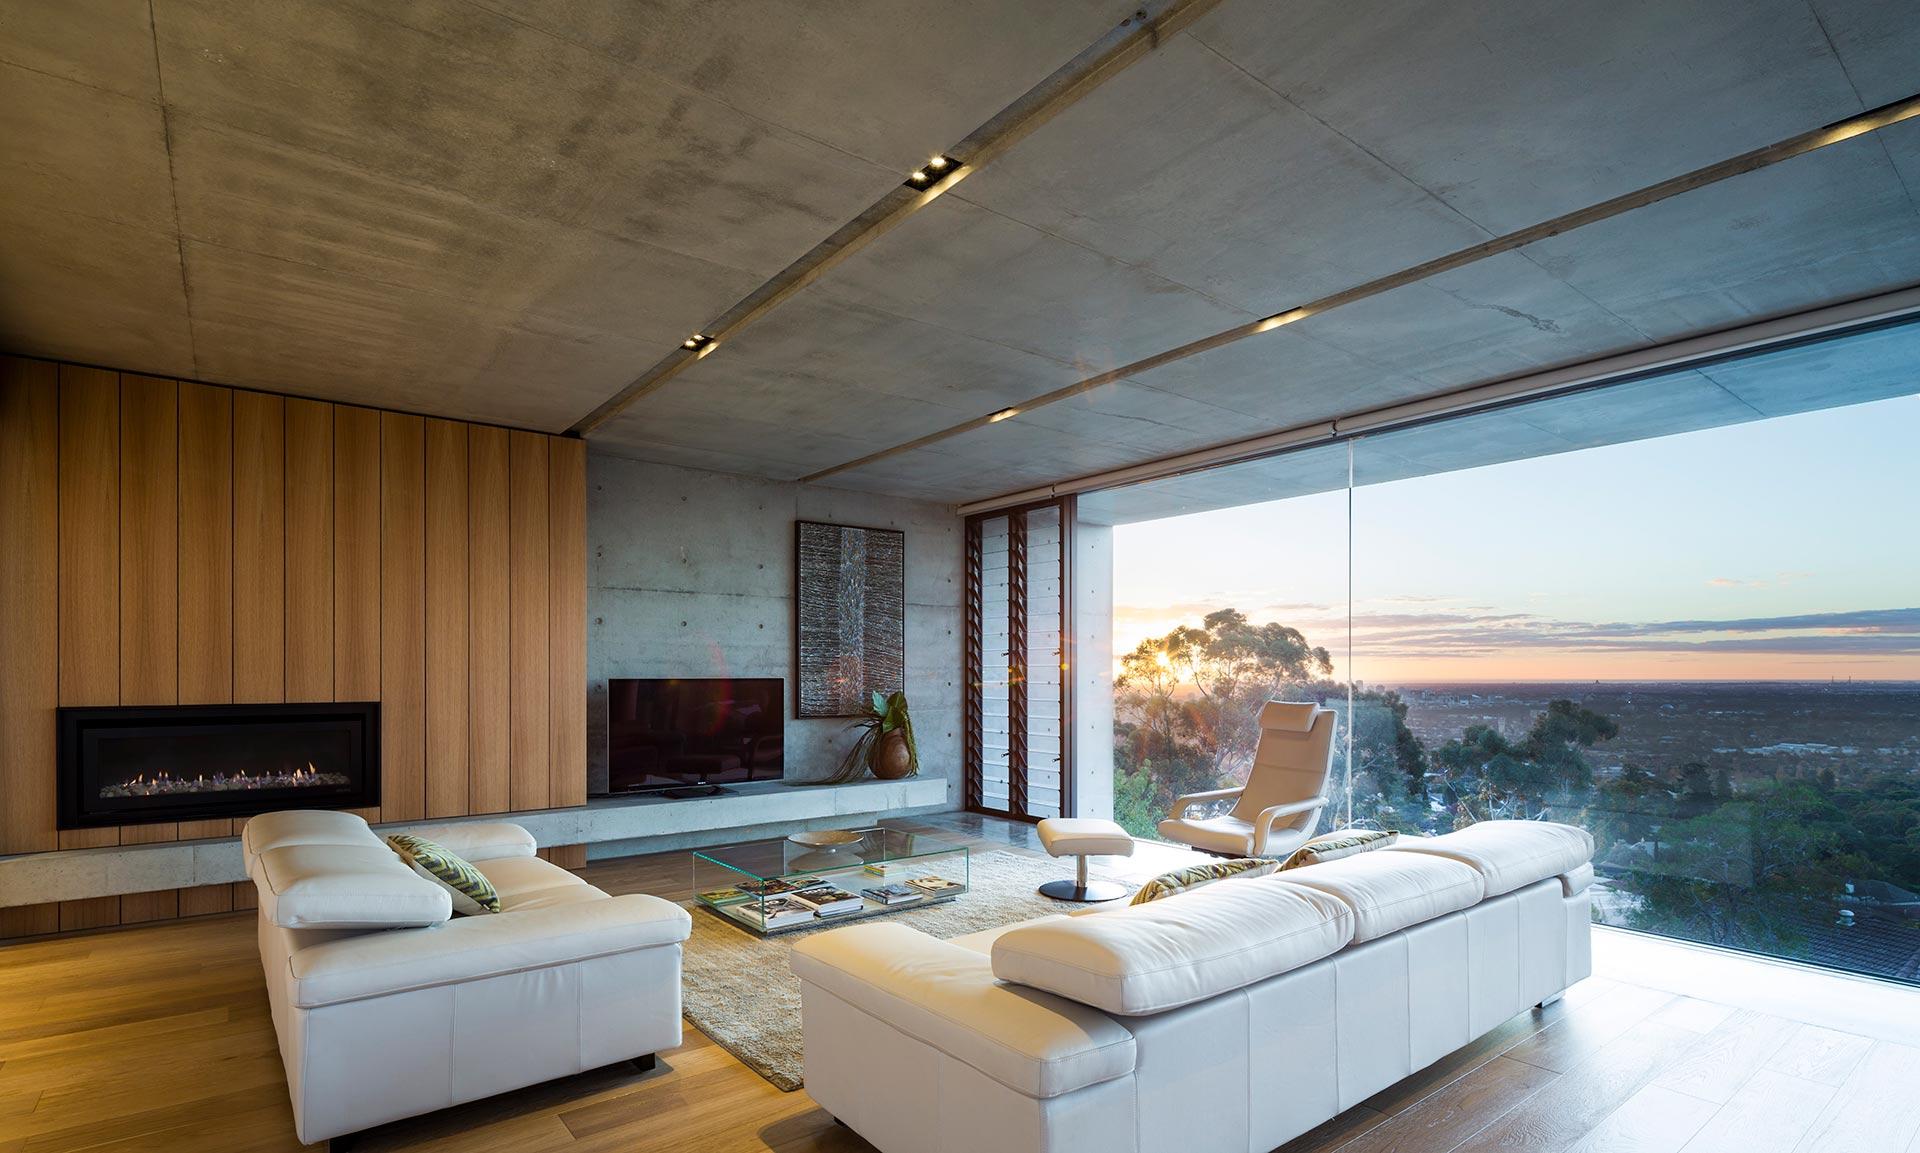 Award Winning Adelaide Home 'Plane Tree House'